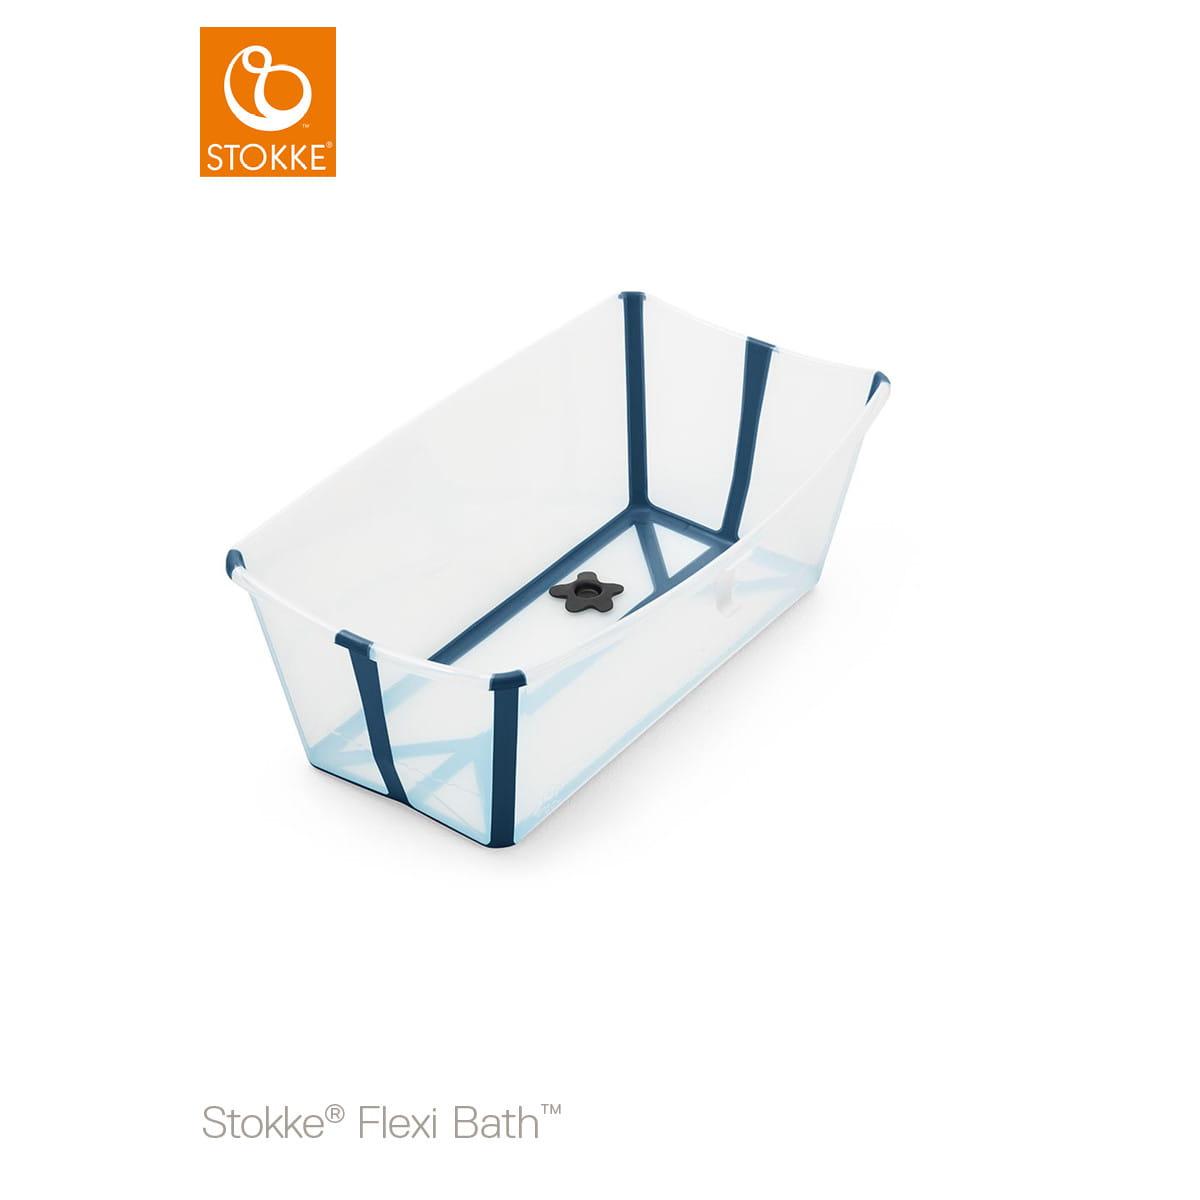 Foldable baby bath tub STOKKE FLEXI BATH transparent blue Nordic ...